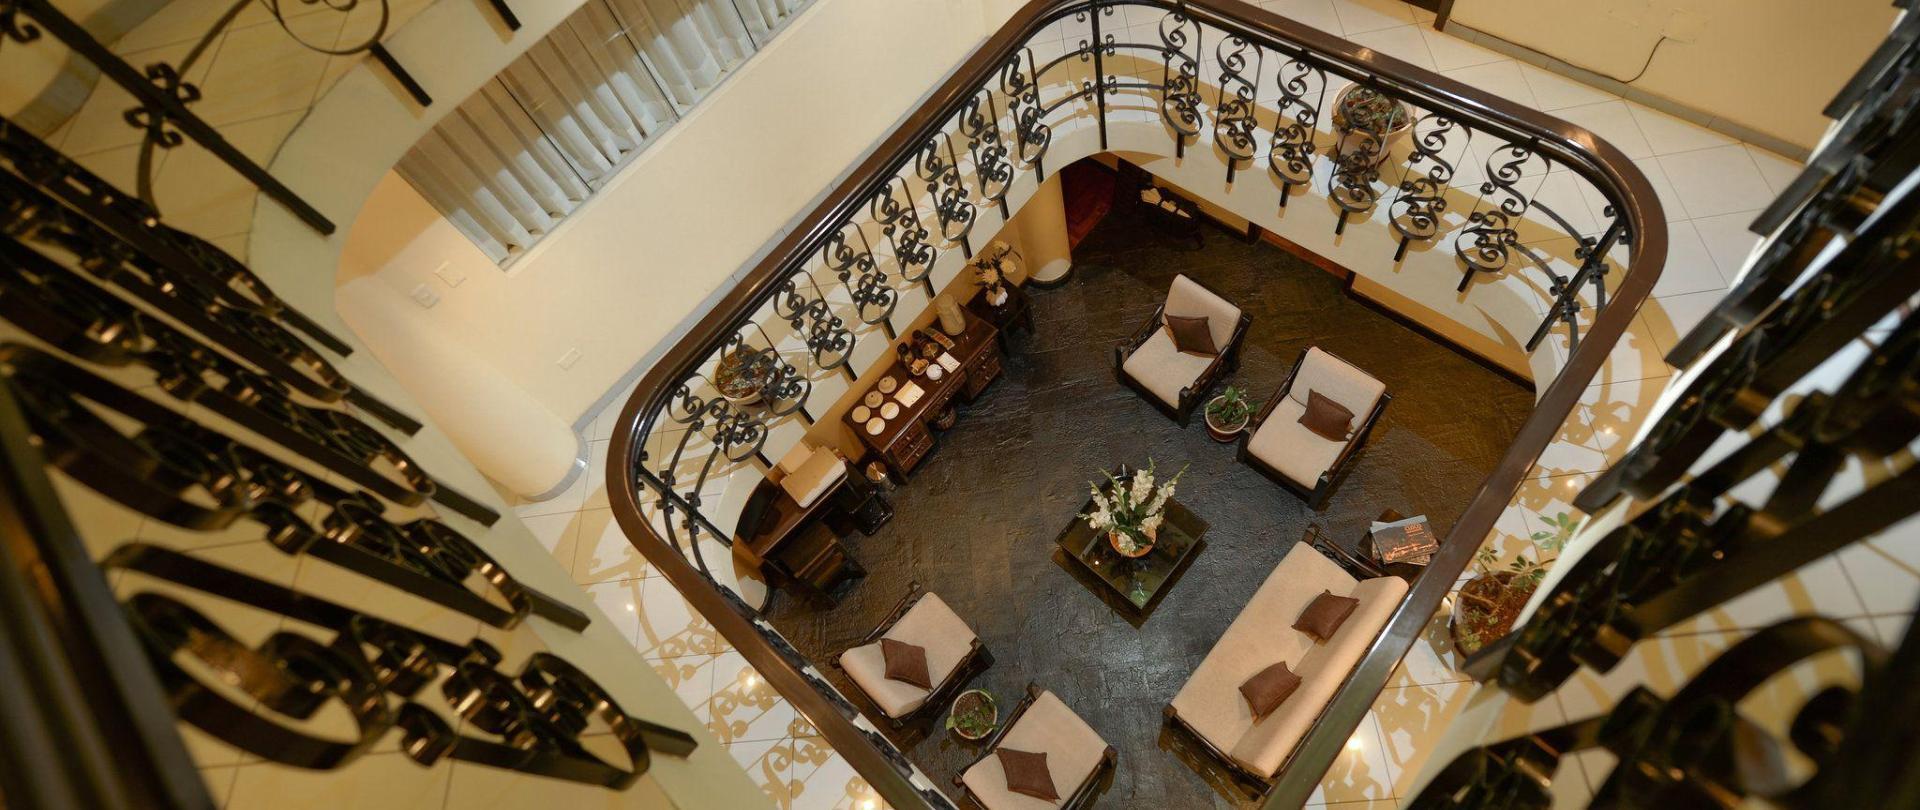 hotel-en-cusco_-tecte-guest-house_-lobby-4.jpg